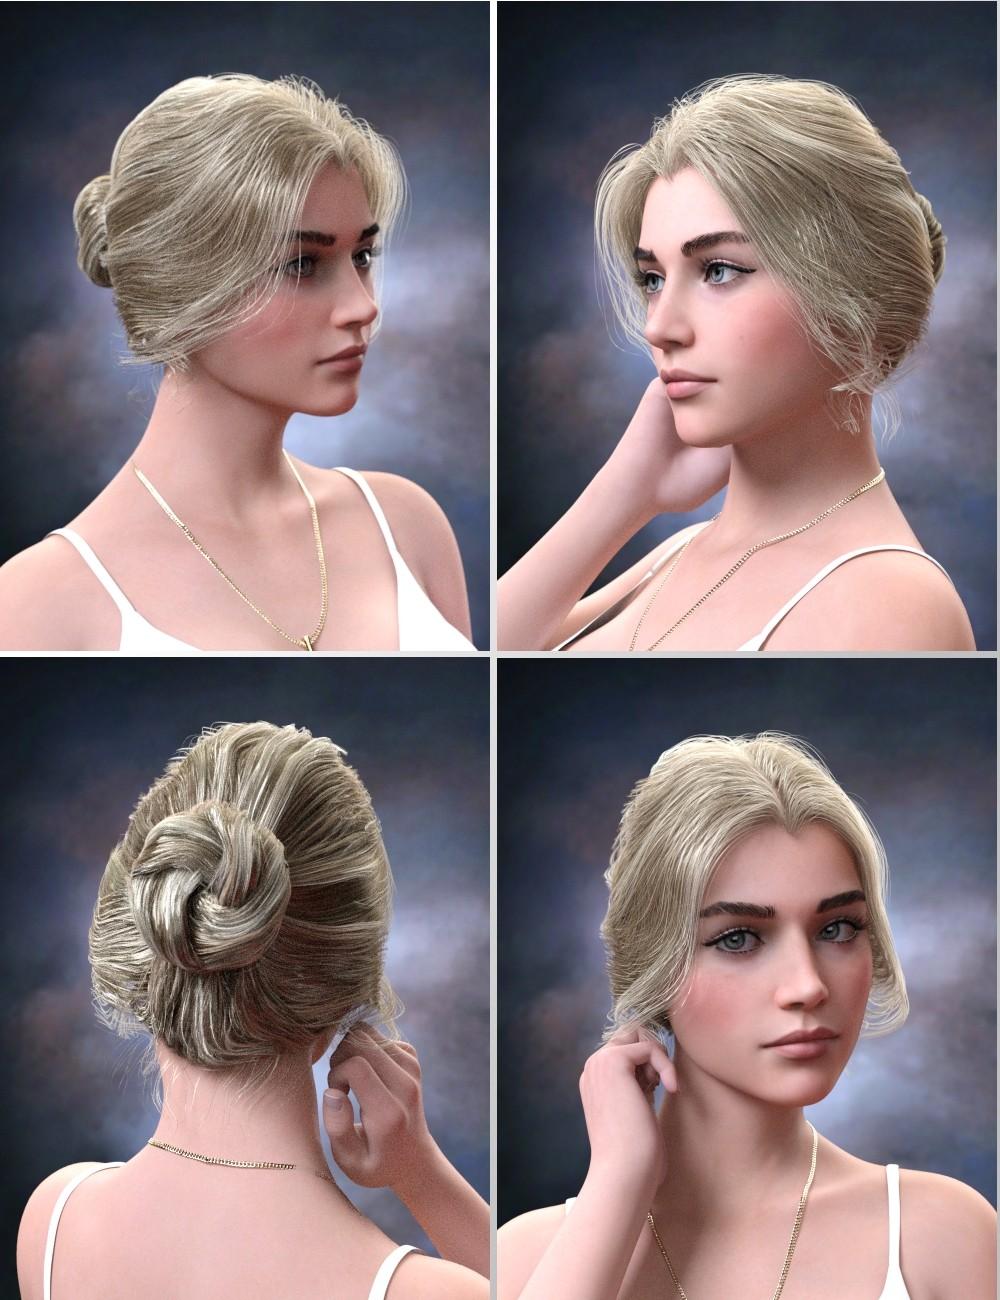 Aurelia Bun Hair For Genesis 8 Female S 3d Models And 3d Software By Daz 3d In 2020 Bun Hairstyles Hair Styles Natural Hair Styles